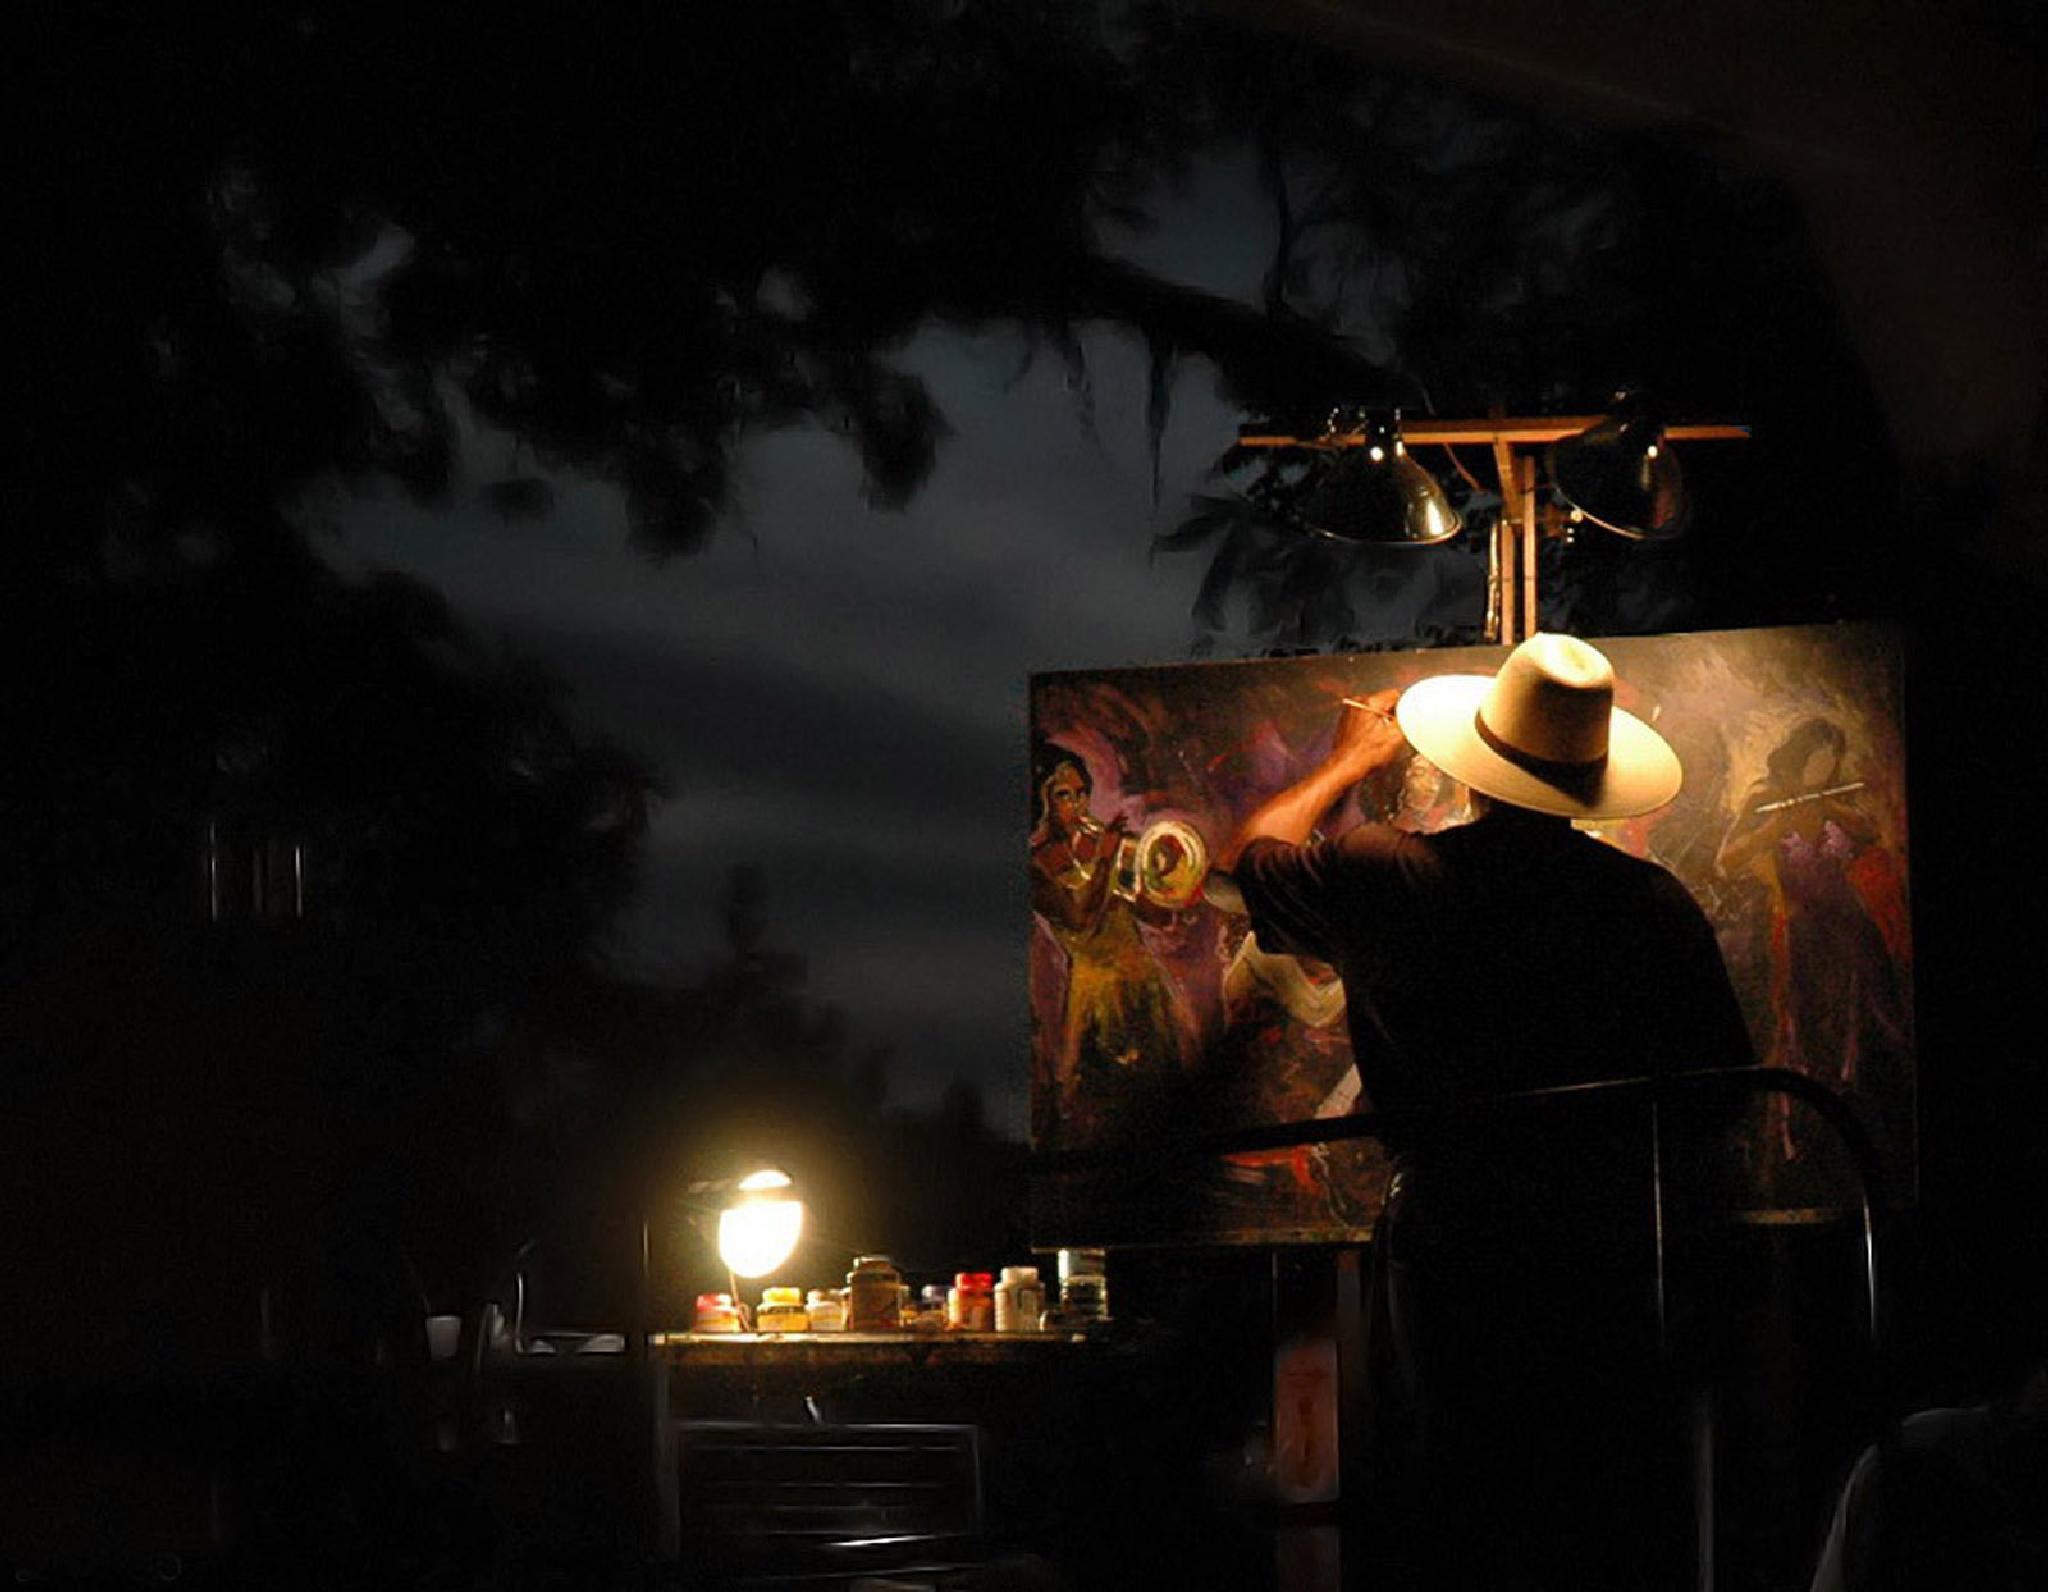 The Artist by papaga